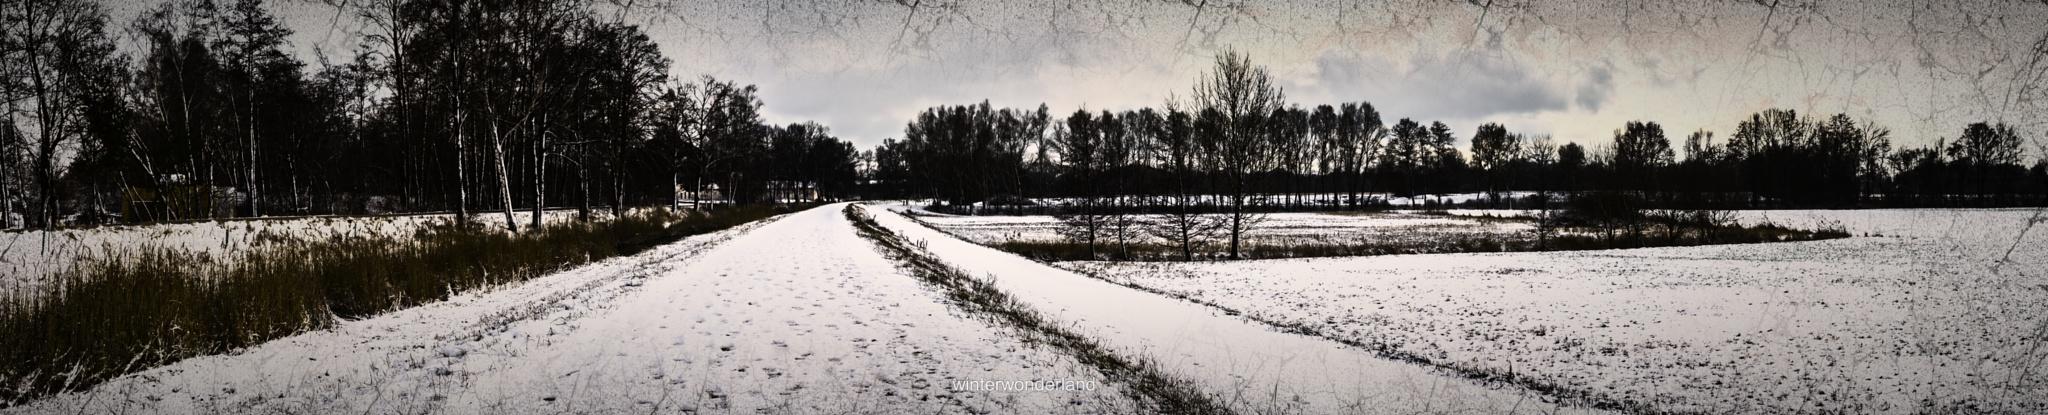 winterwonderland by JoshuaHolznagel